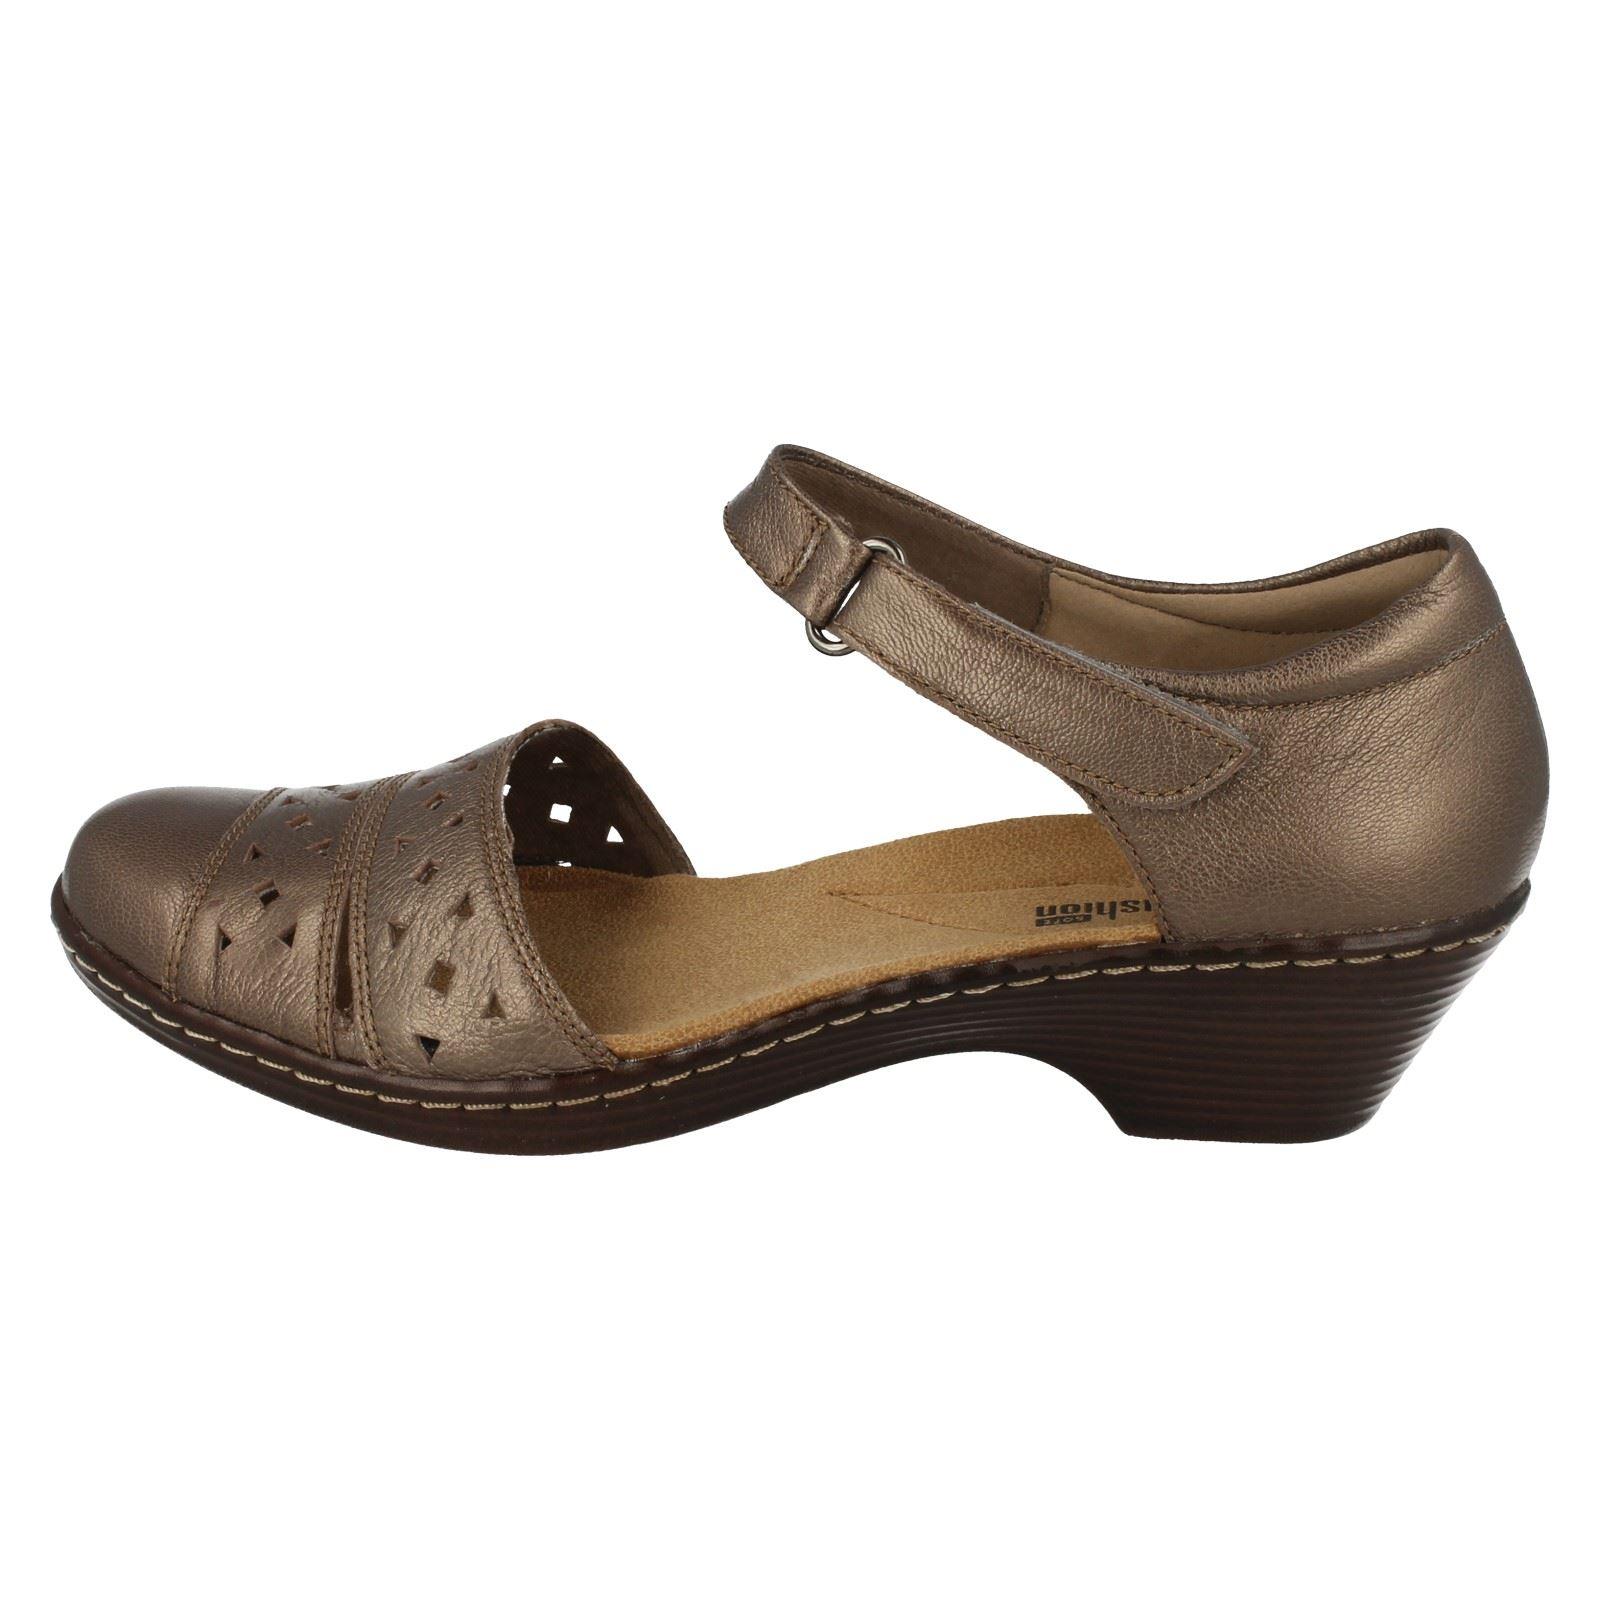 Damas Clarks Zapatos Informales Wendy Laurel